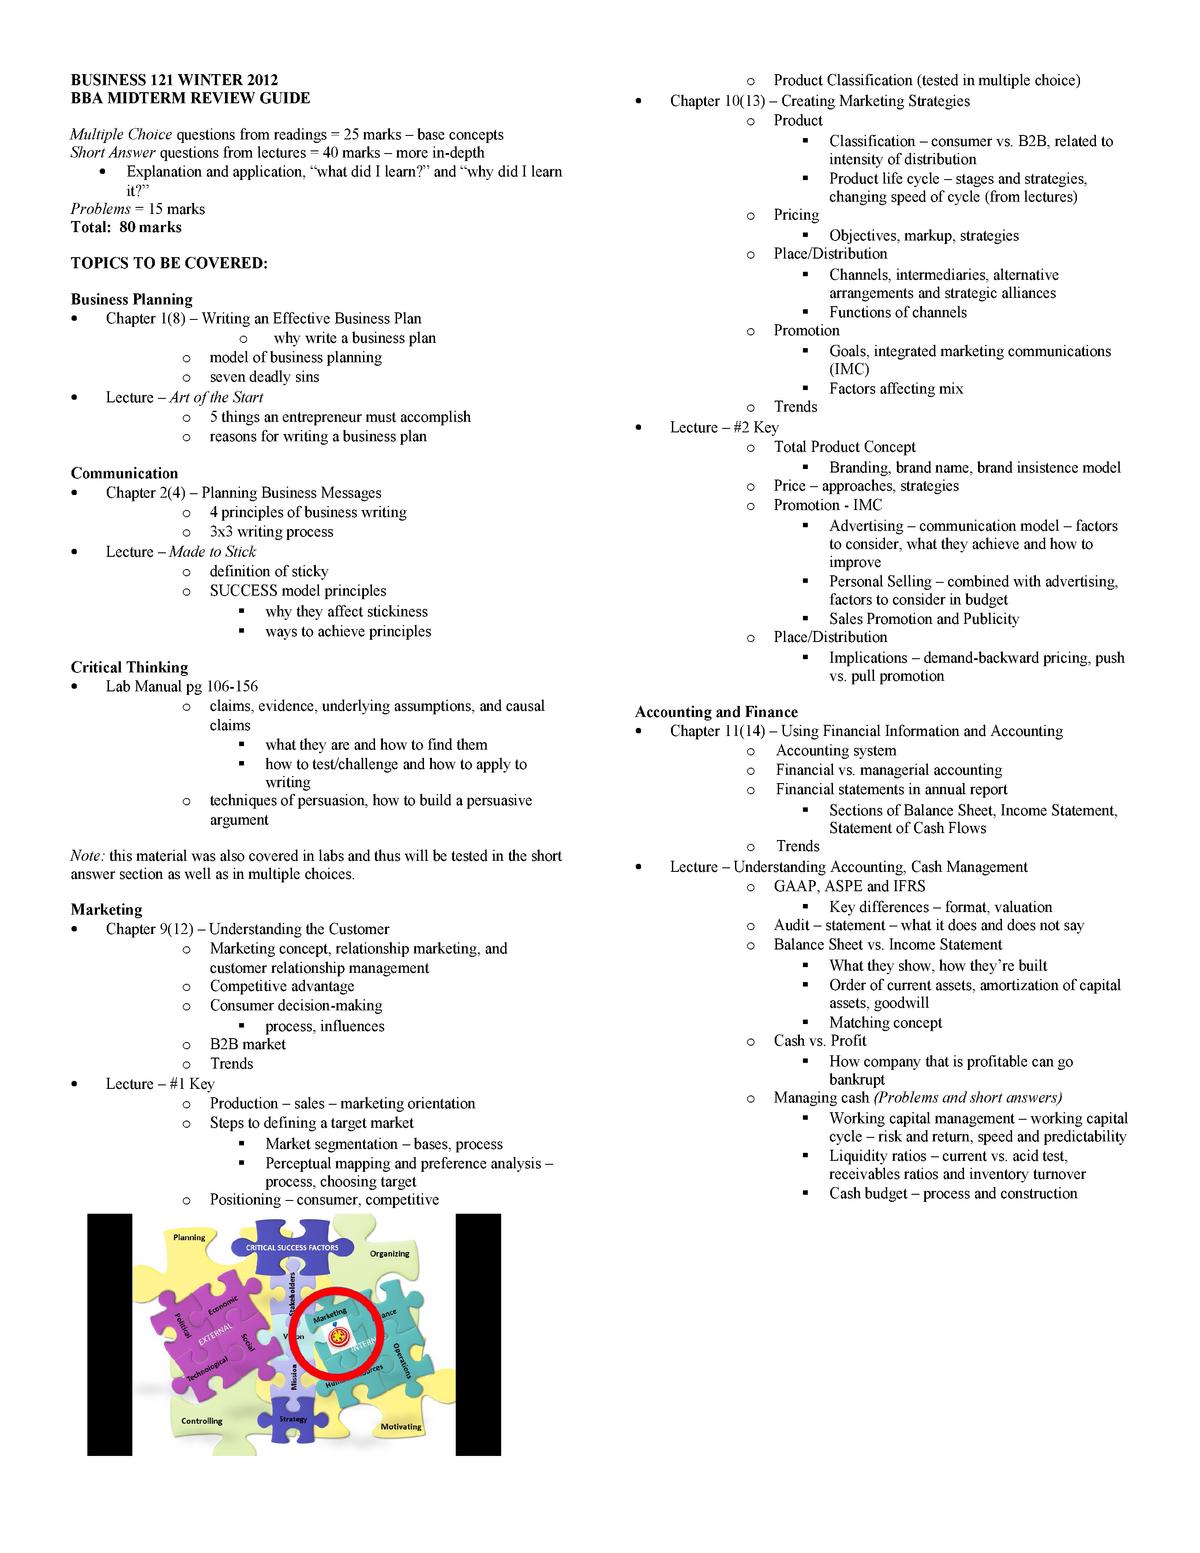 212167926 BU121 Study Guide - Functional Areas - StuDocu